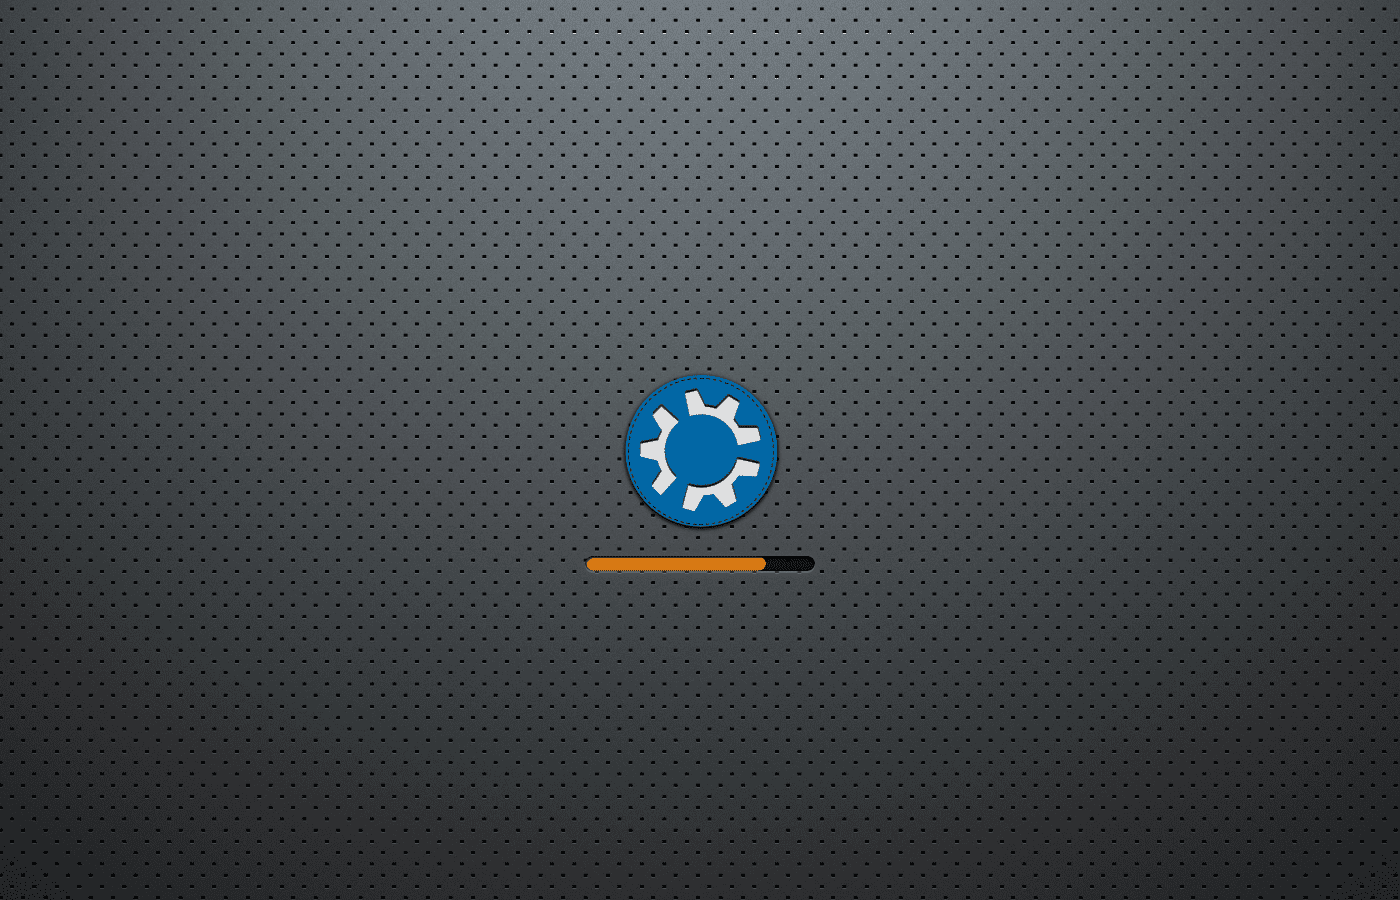 kubuntu_minimalistic_splash_by_thales_img-d45x77a